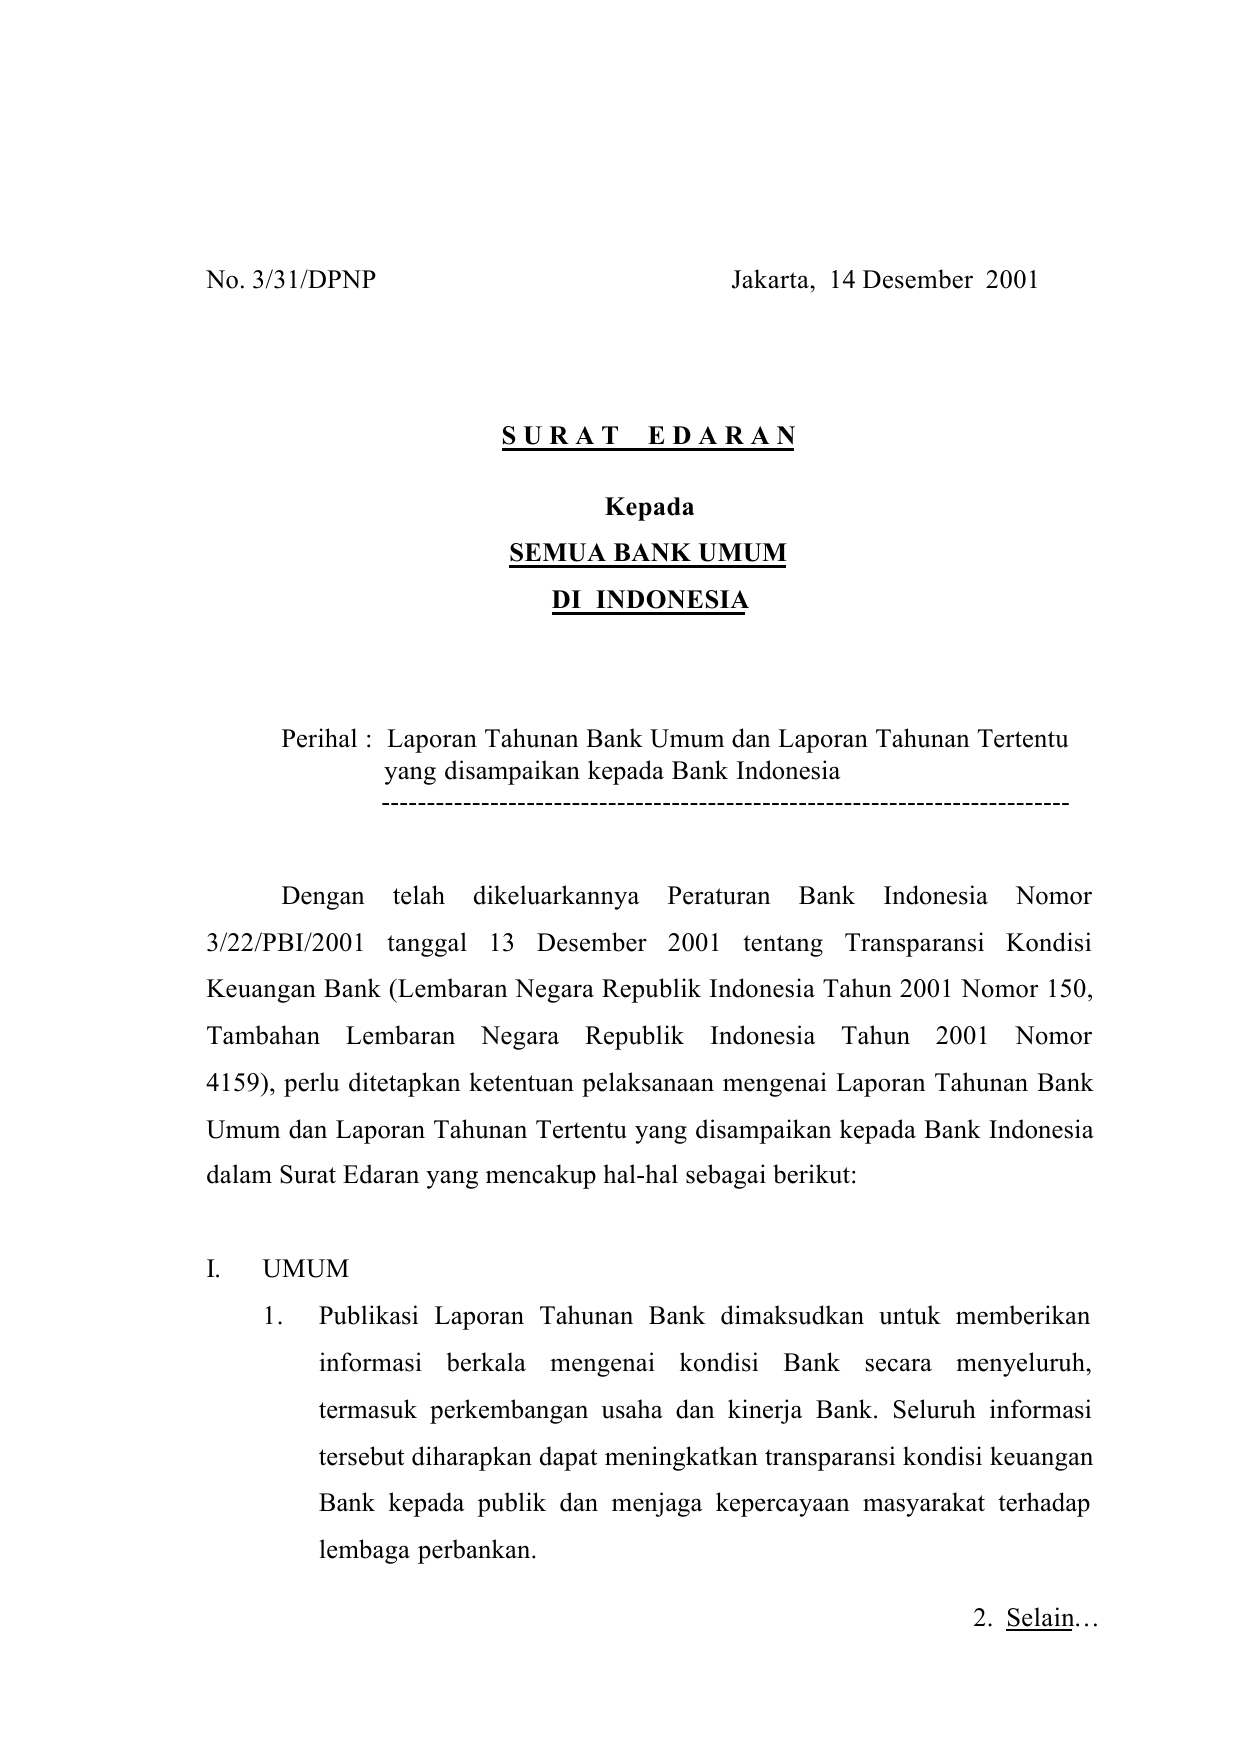 Laporan Tahun Bank Indonesia